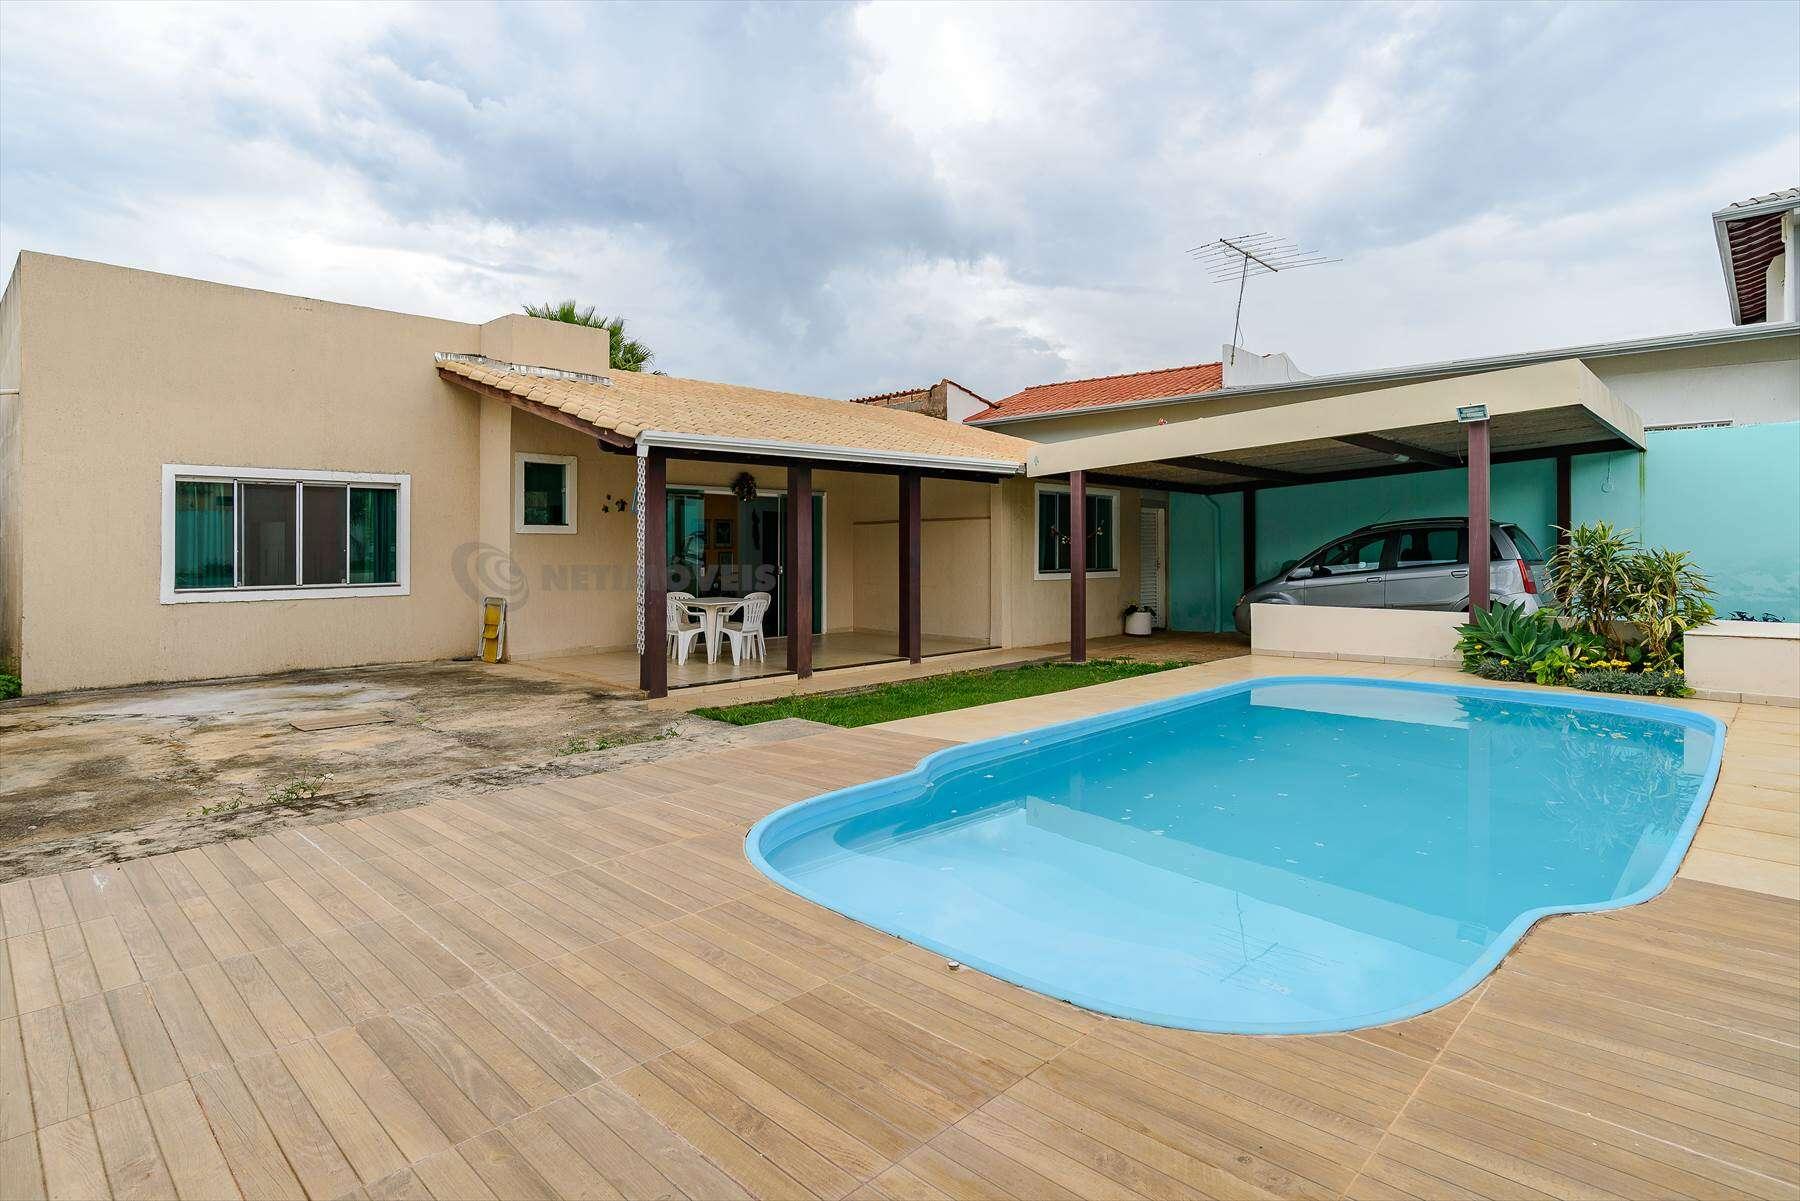 casa em condomínio,casa,distrito federal,lago sul,brasíliacasa em condomínio,brasília,